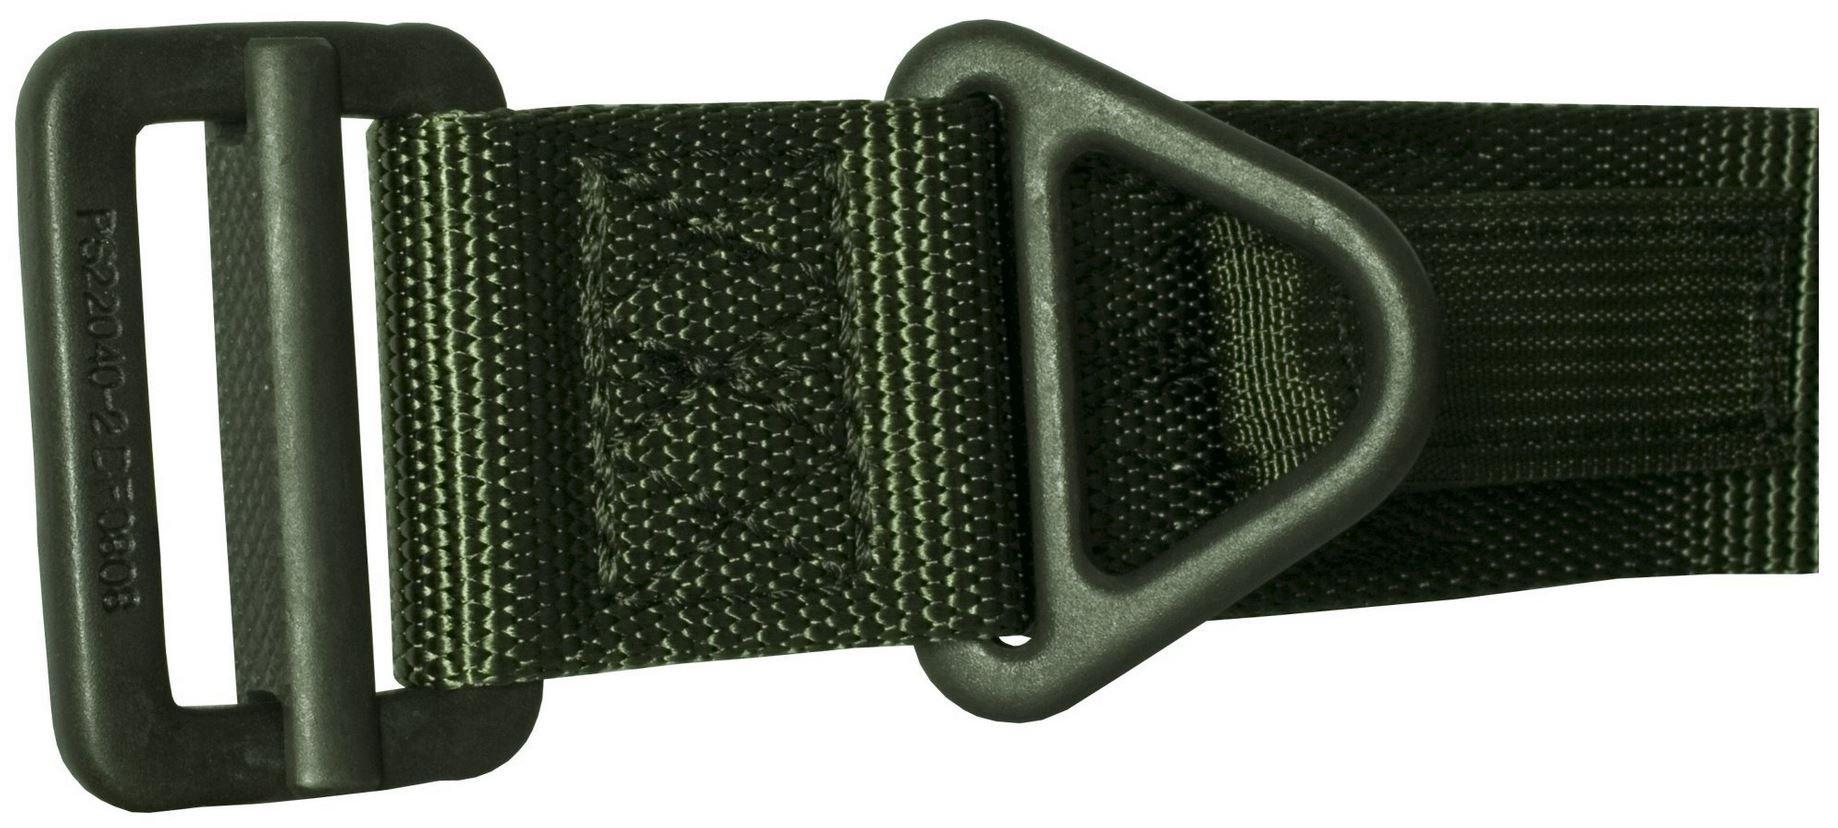 BLACKHAWK! CQB/Rigger's Belt - Olive Drab, Small